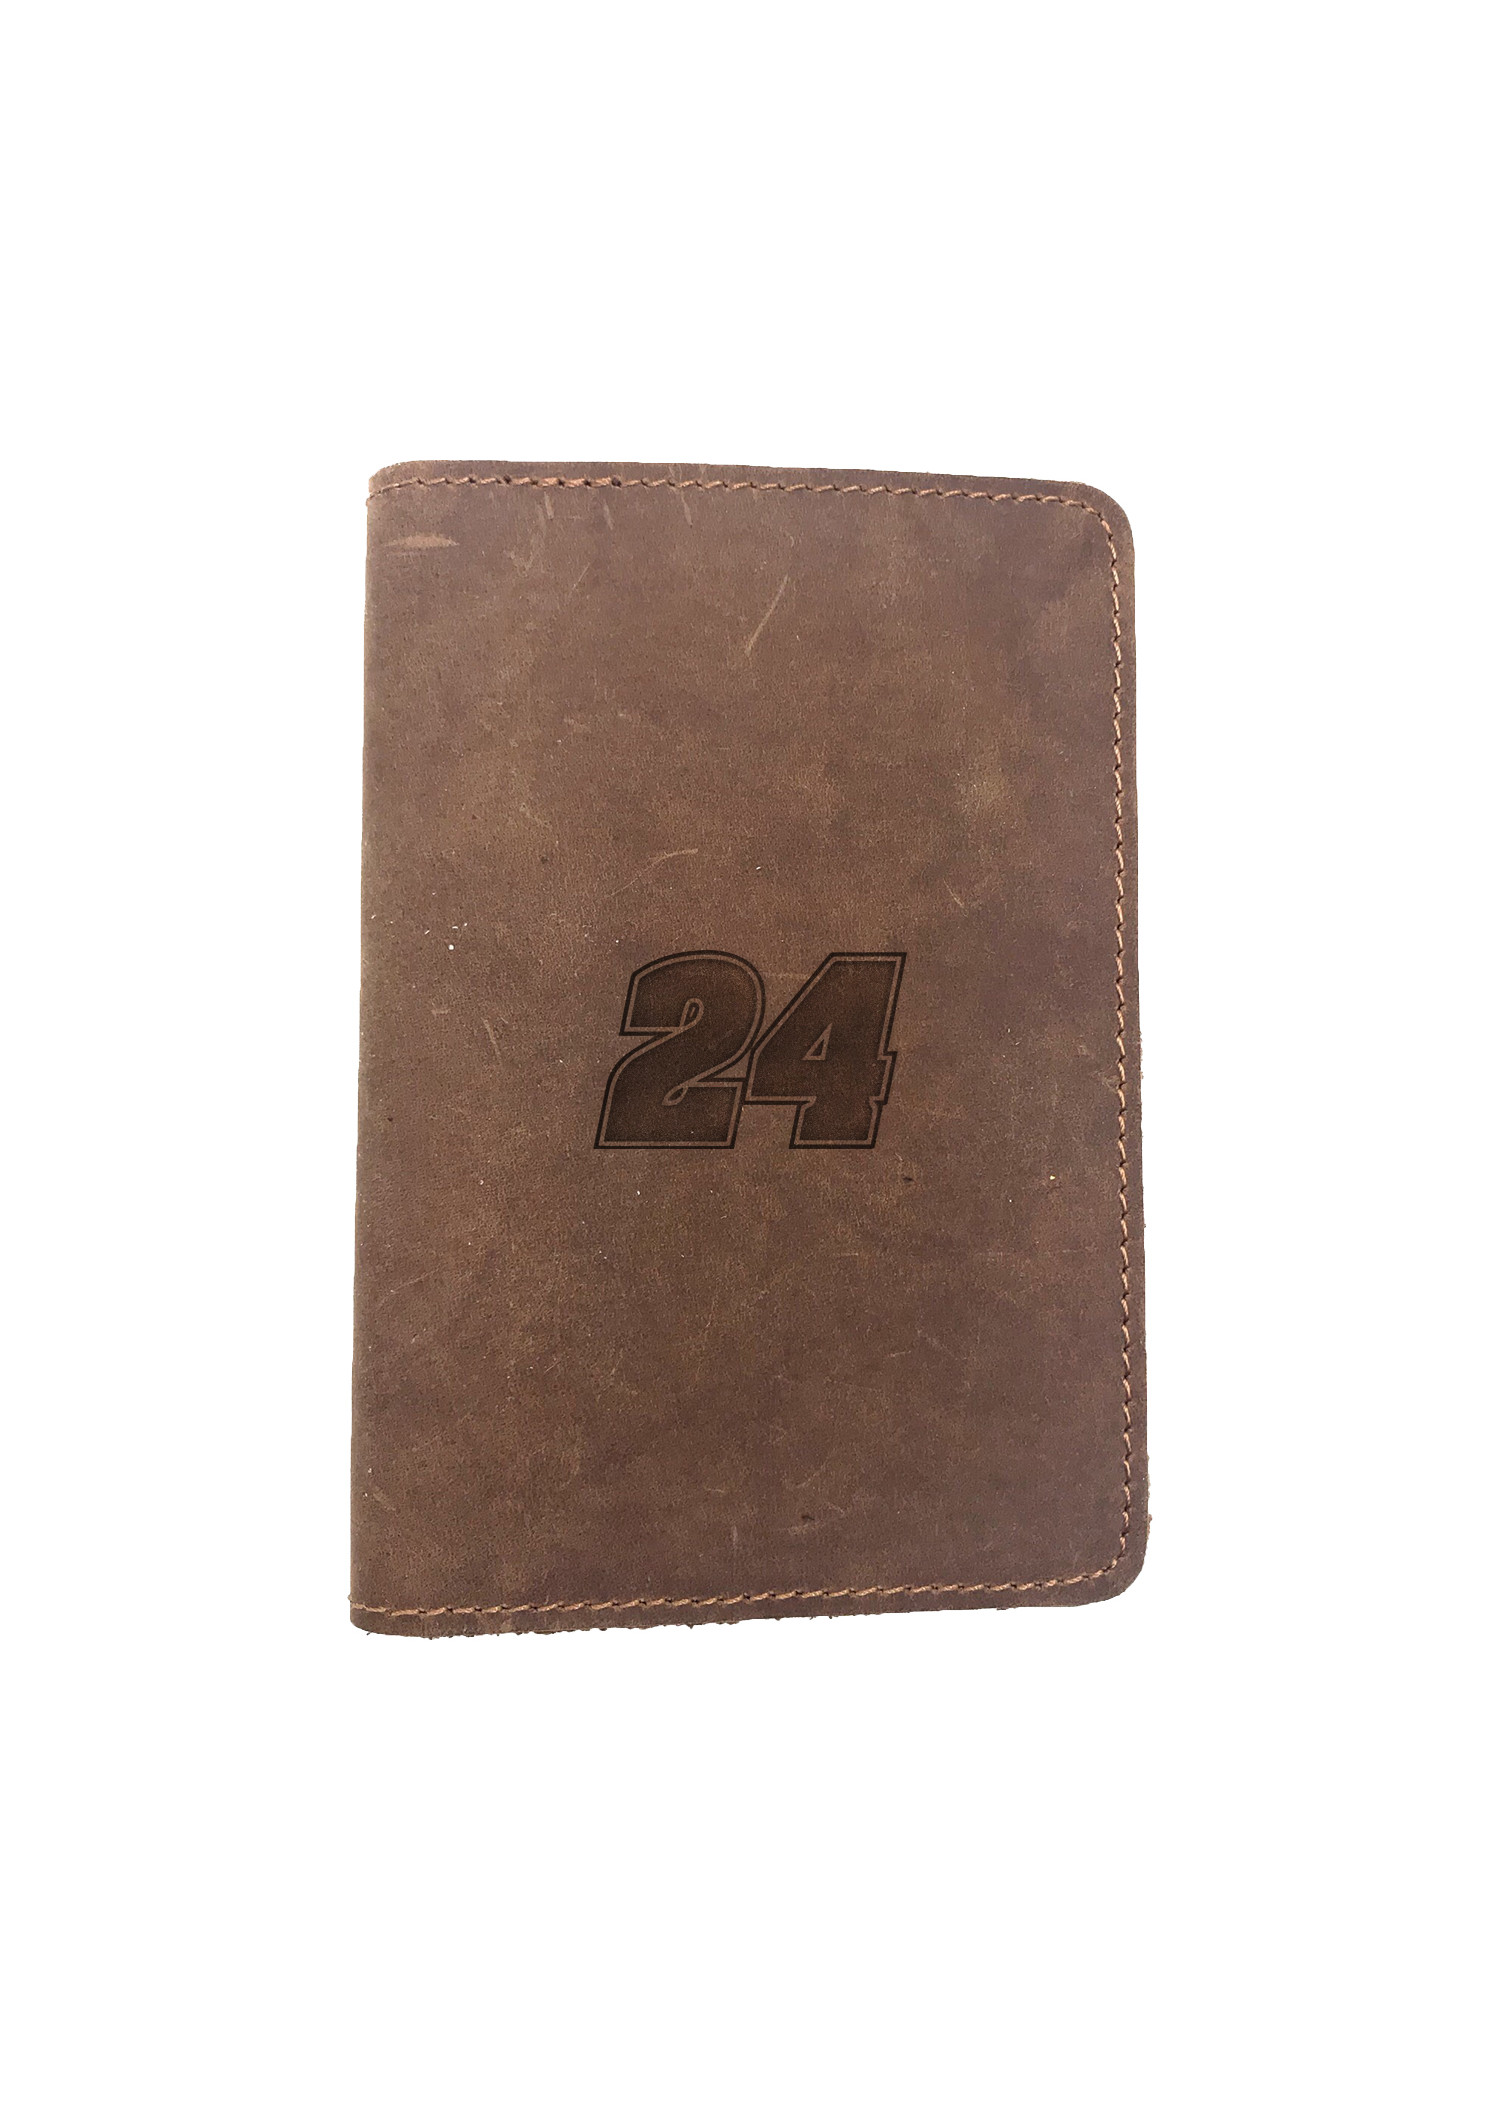 Passport Cover Bao Da Hộ Chiếu Da Sáp Khắc Hình Số 24 NASCAR (BROWN)